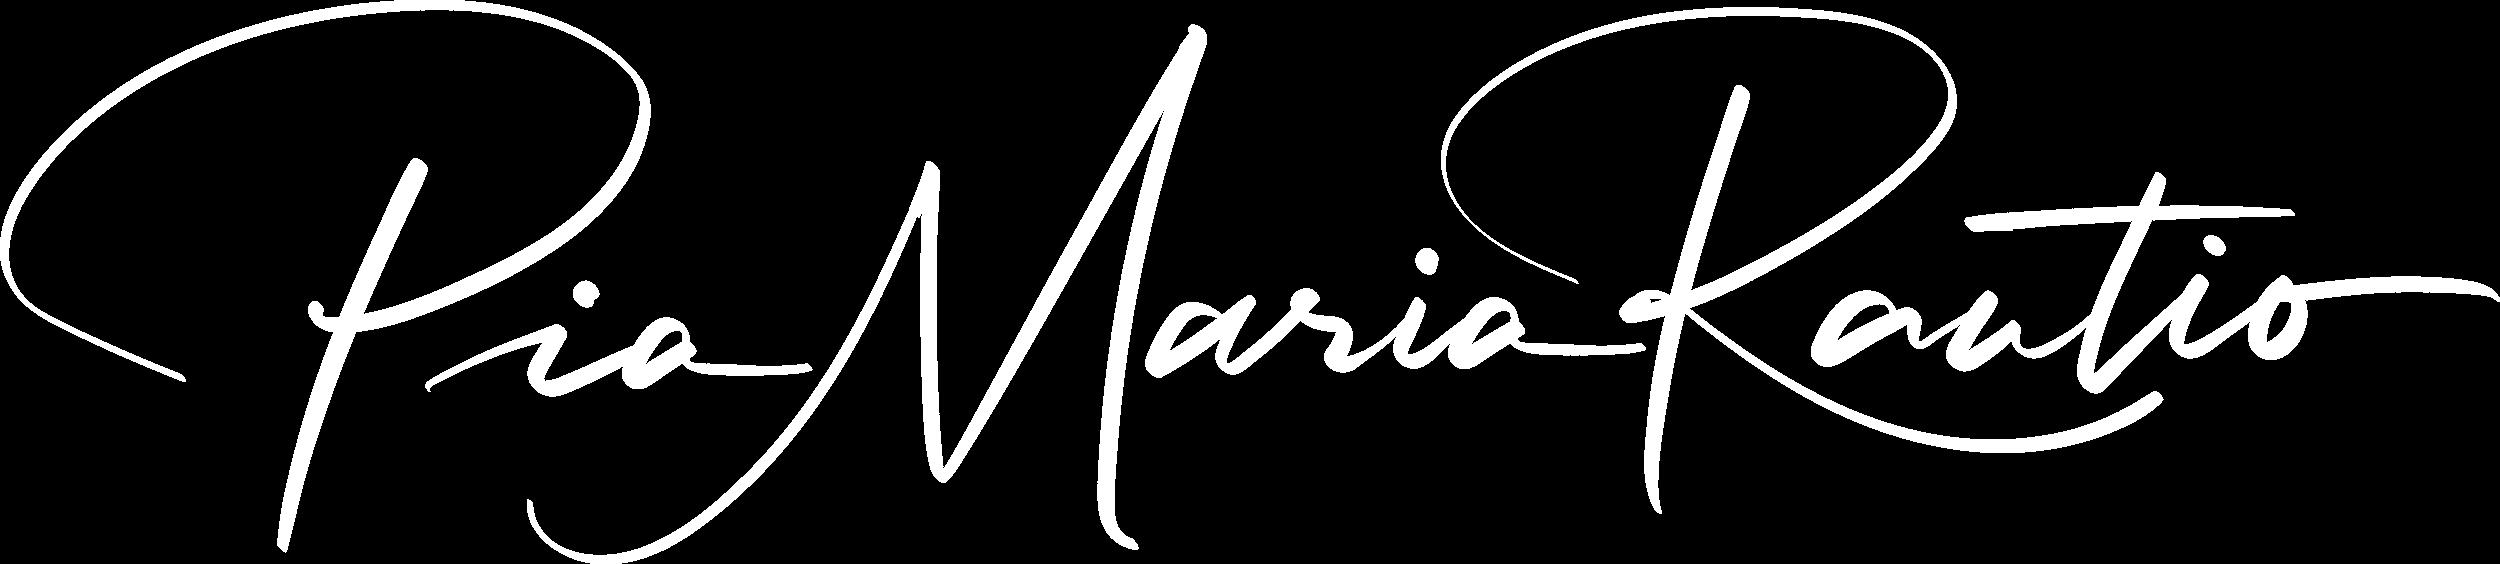 Pia Maria Rautio